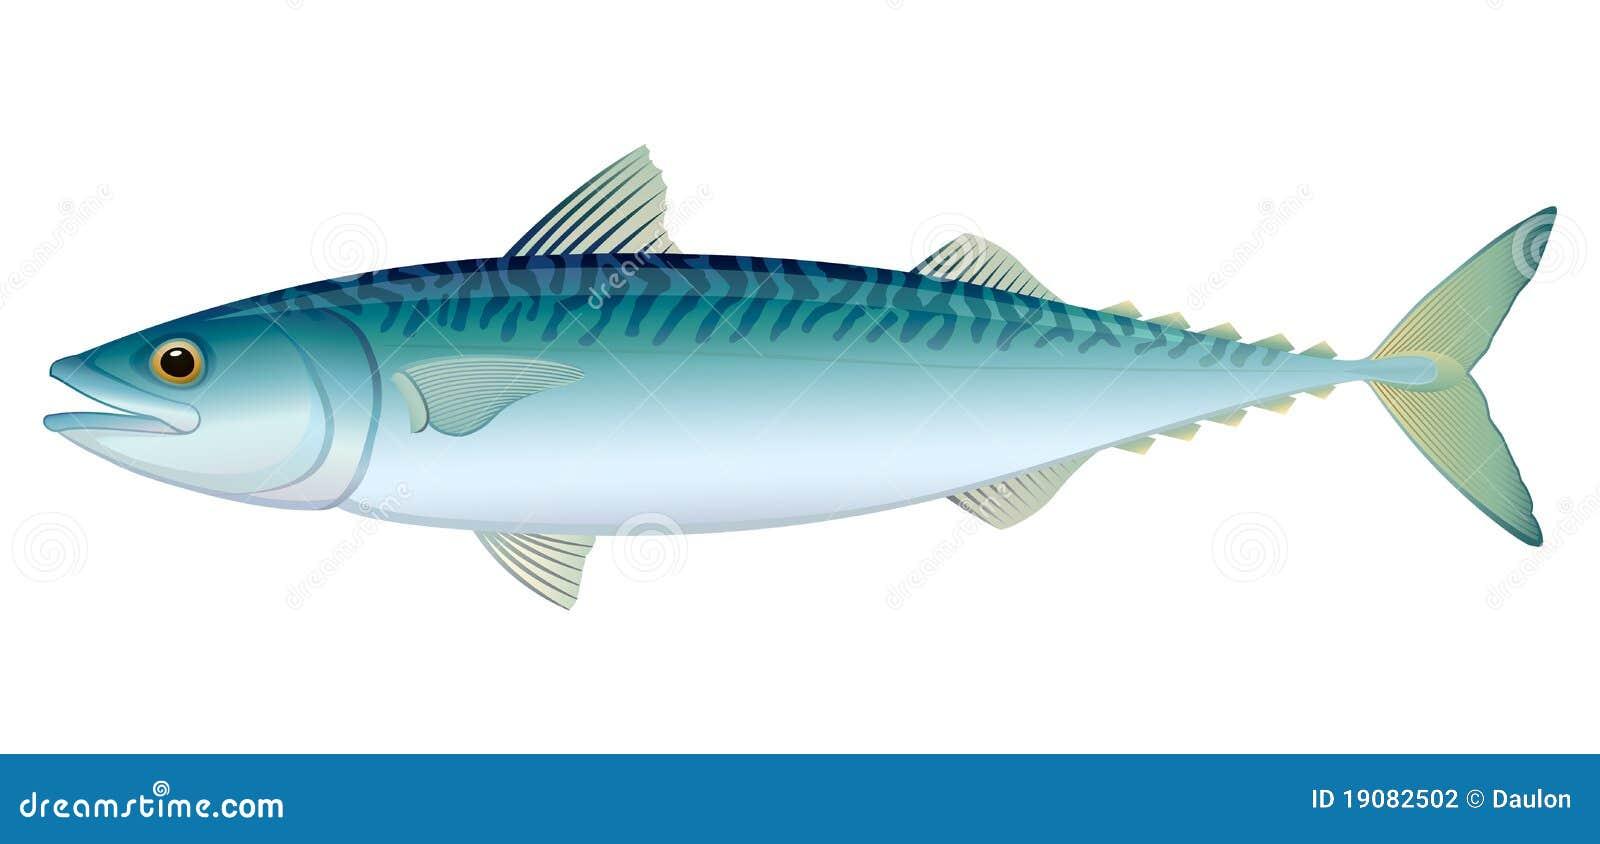 atlantic mackerel stock photography image 19082502 Sailfish Art sailfish clipart black and white